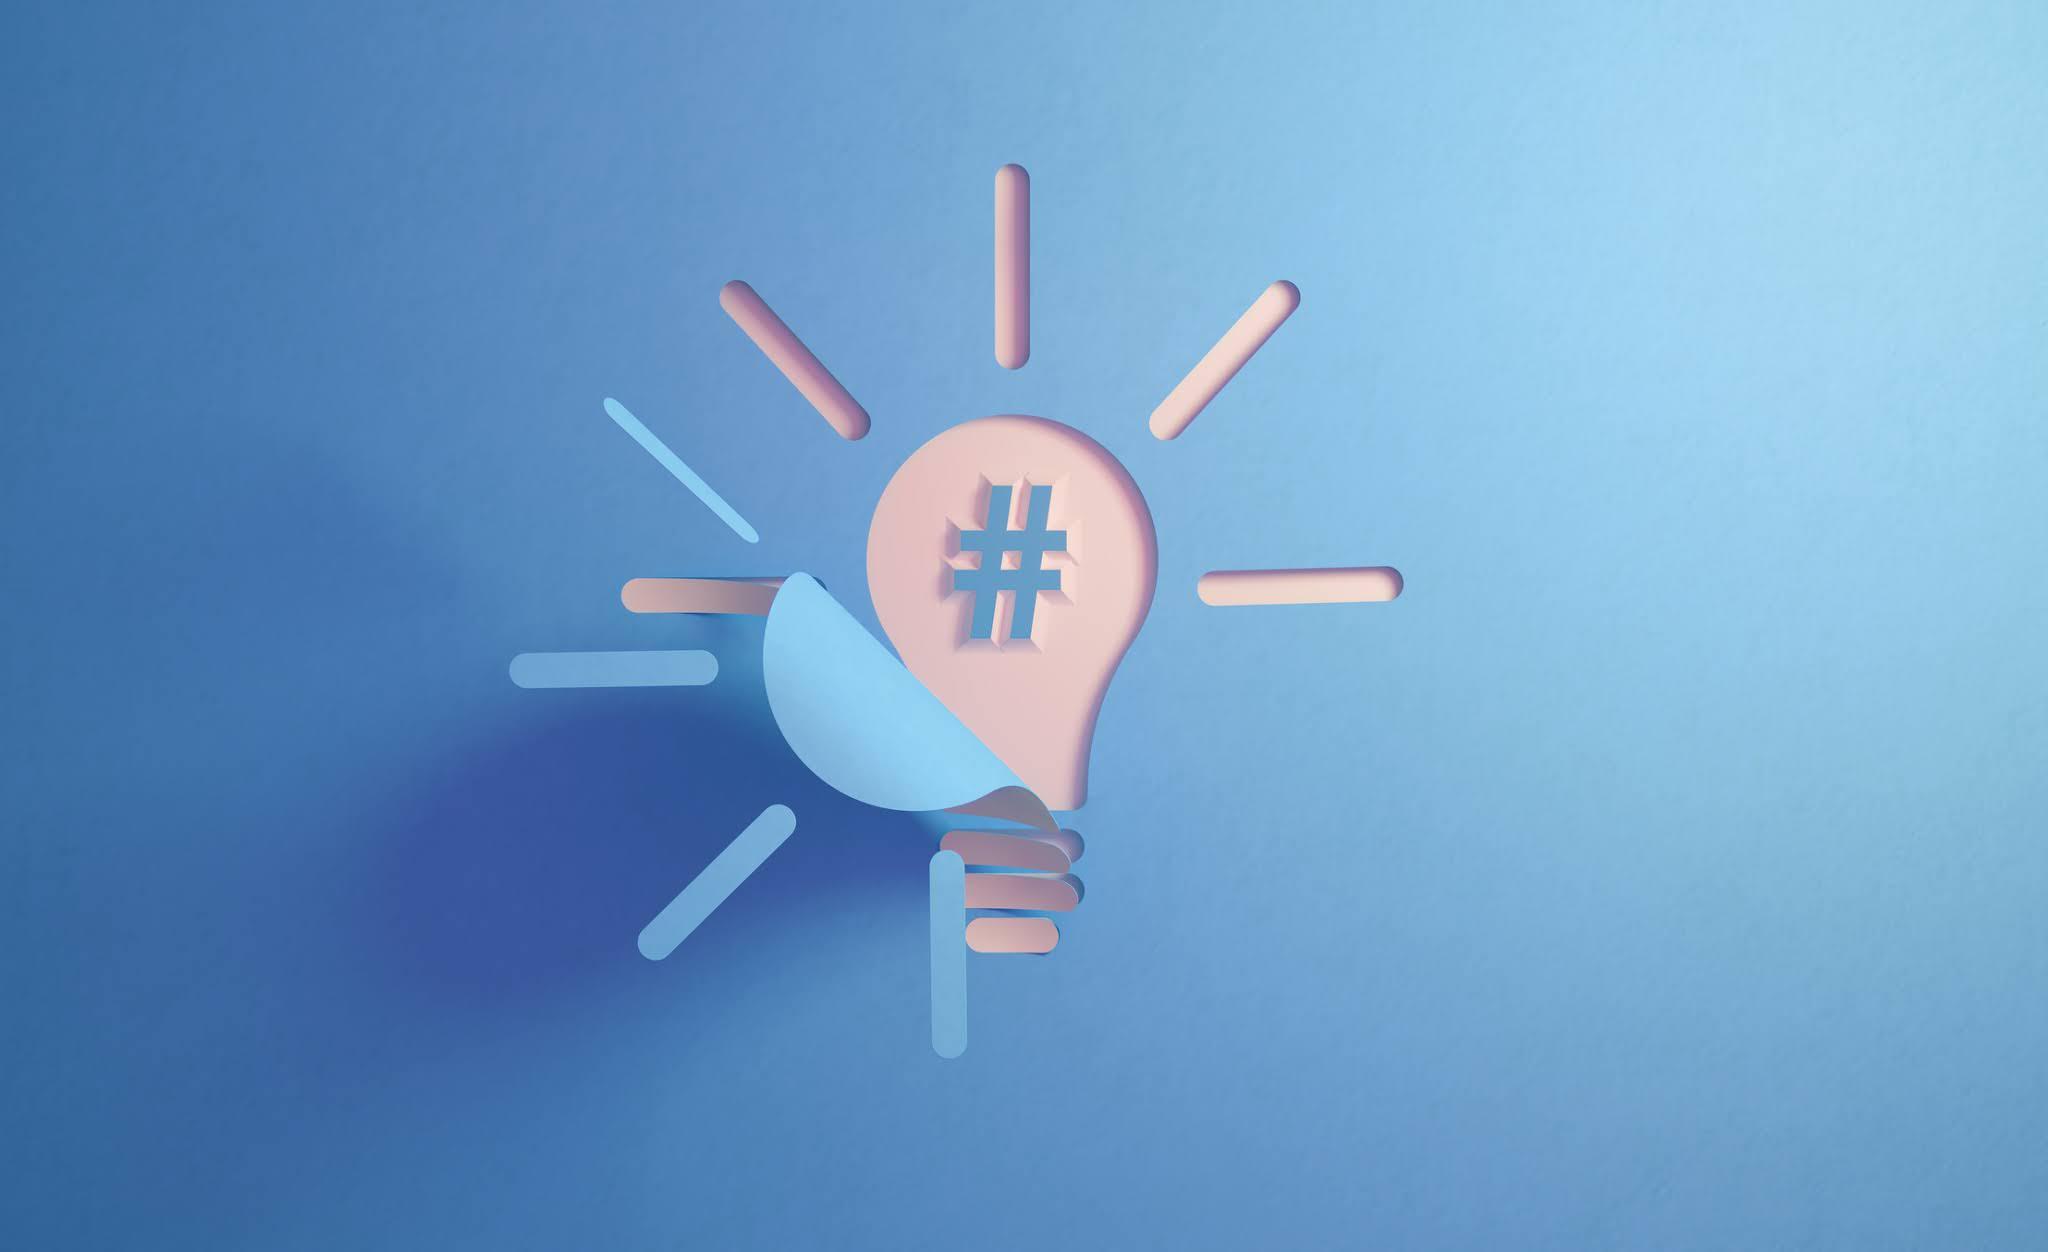 Social media hashtag and light build